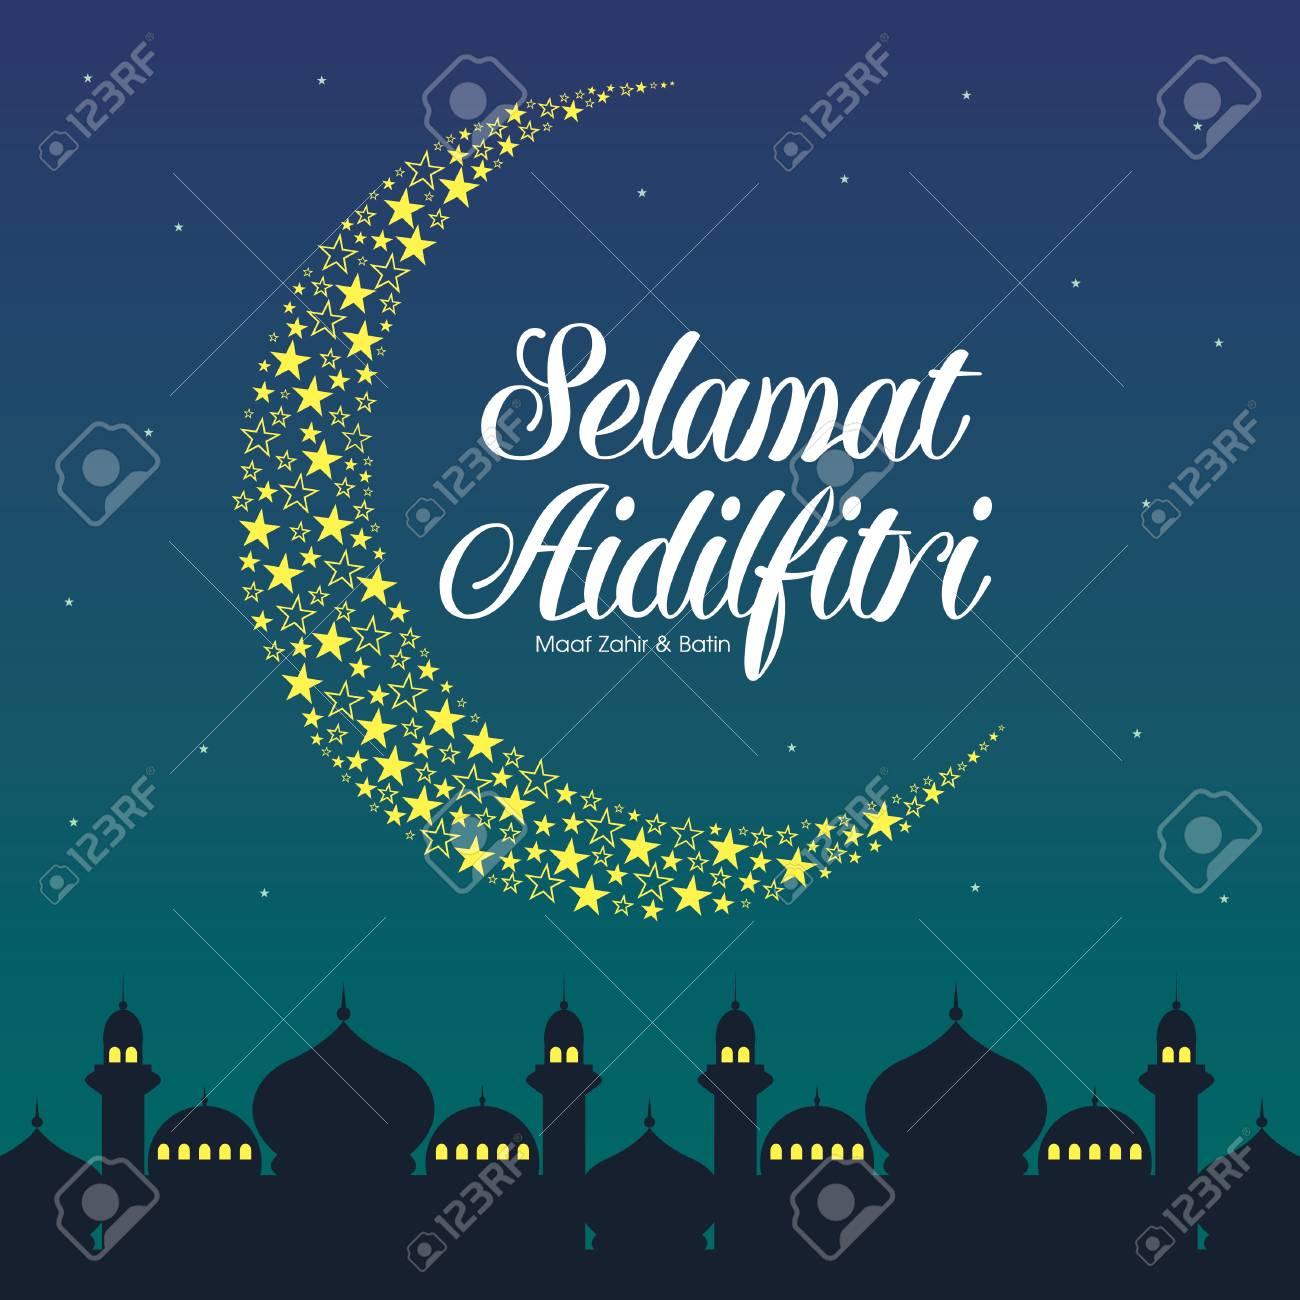 Selamat Hari Raya Aidilfitri vector illustration with traditional malay mosque. Caption: Fasting Day of Celebration - 79013968